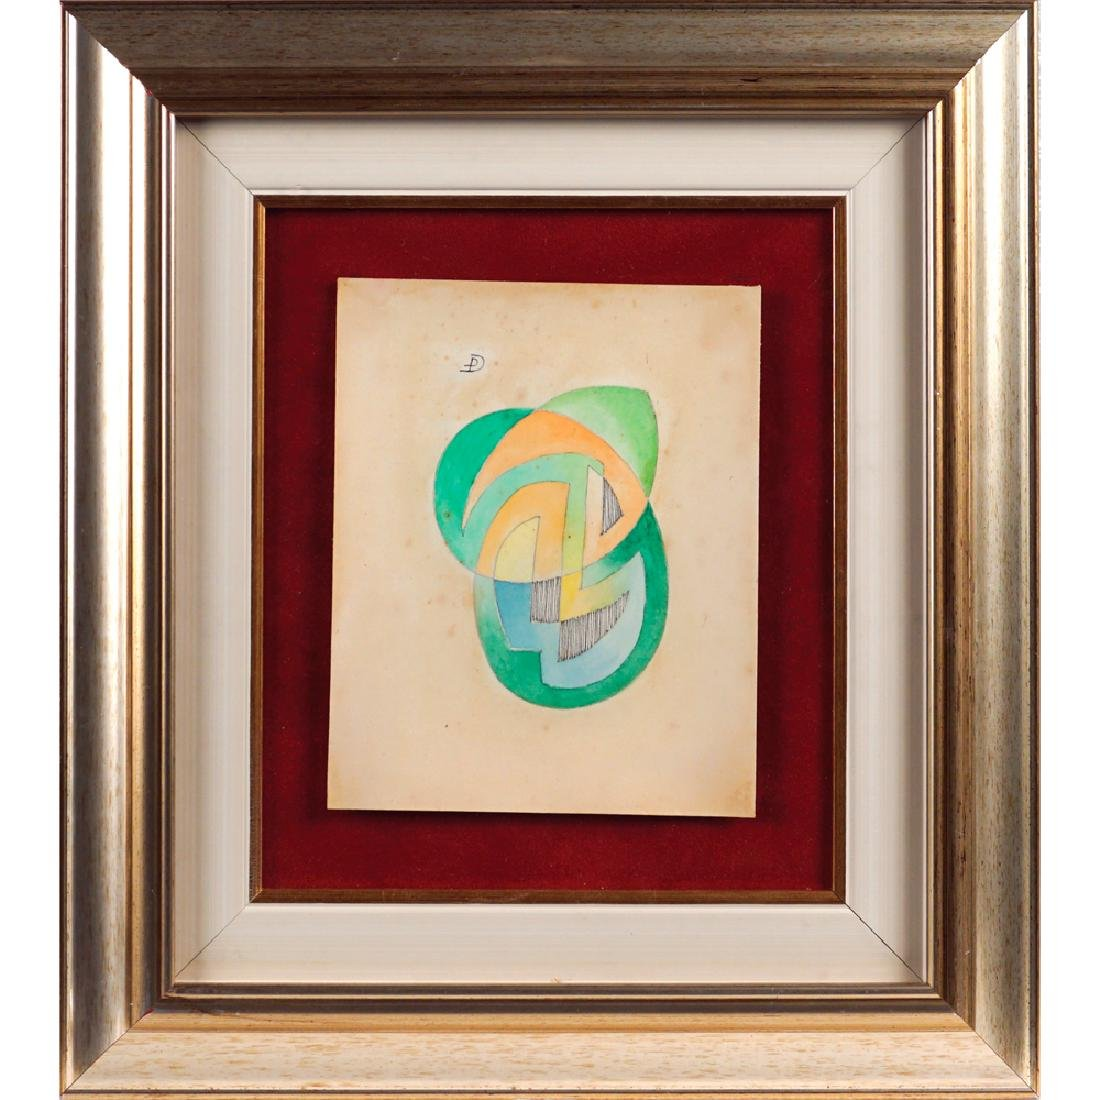 Federico Pfister Napoli 1898 - Roma 1975 17 7x14.3 cm.